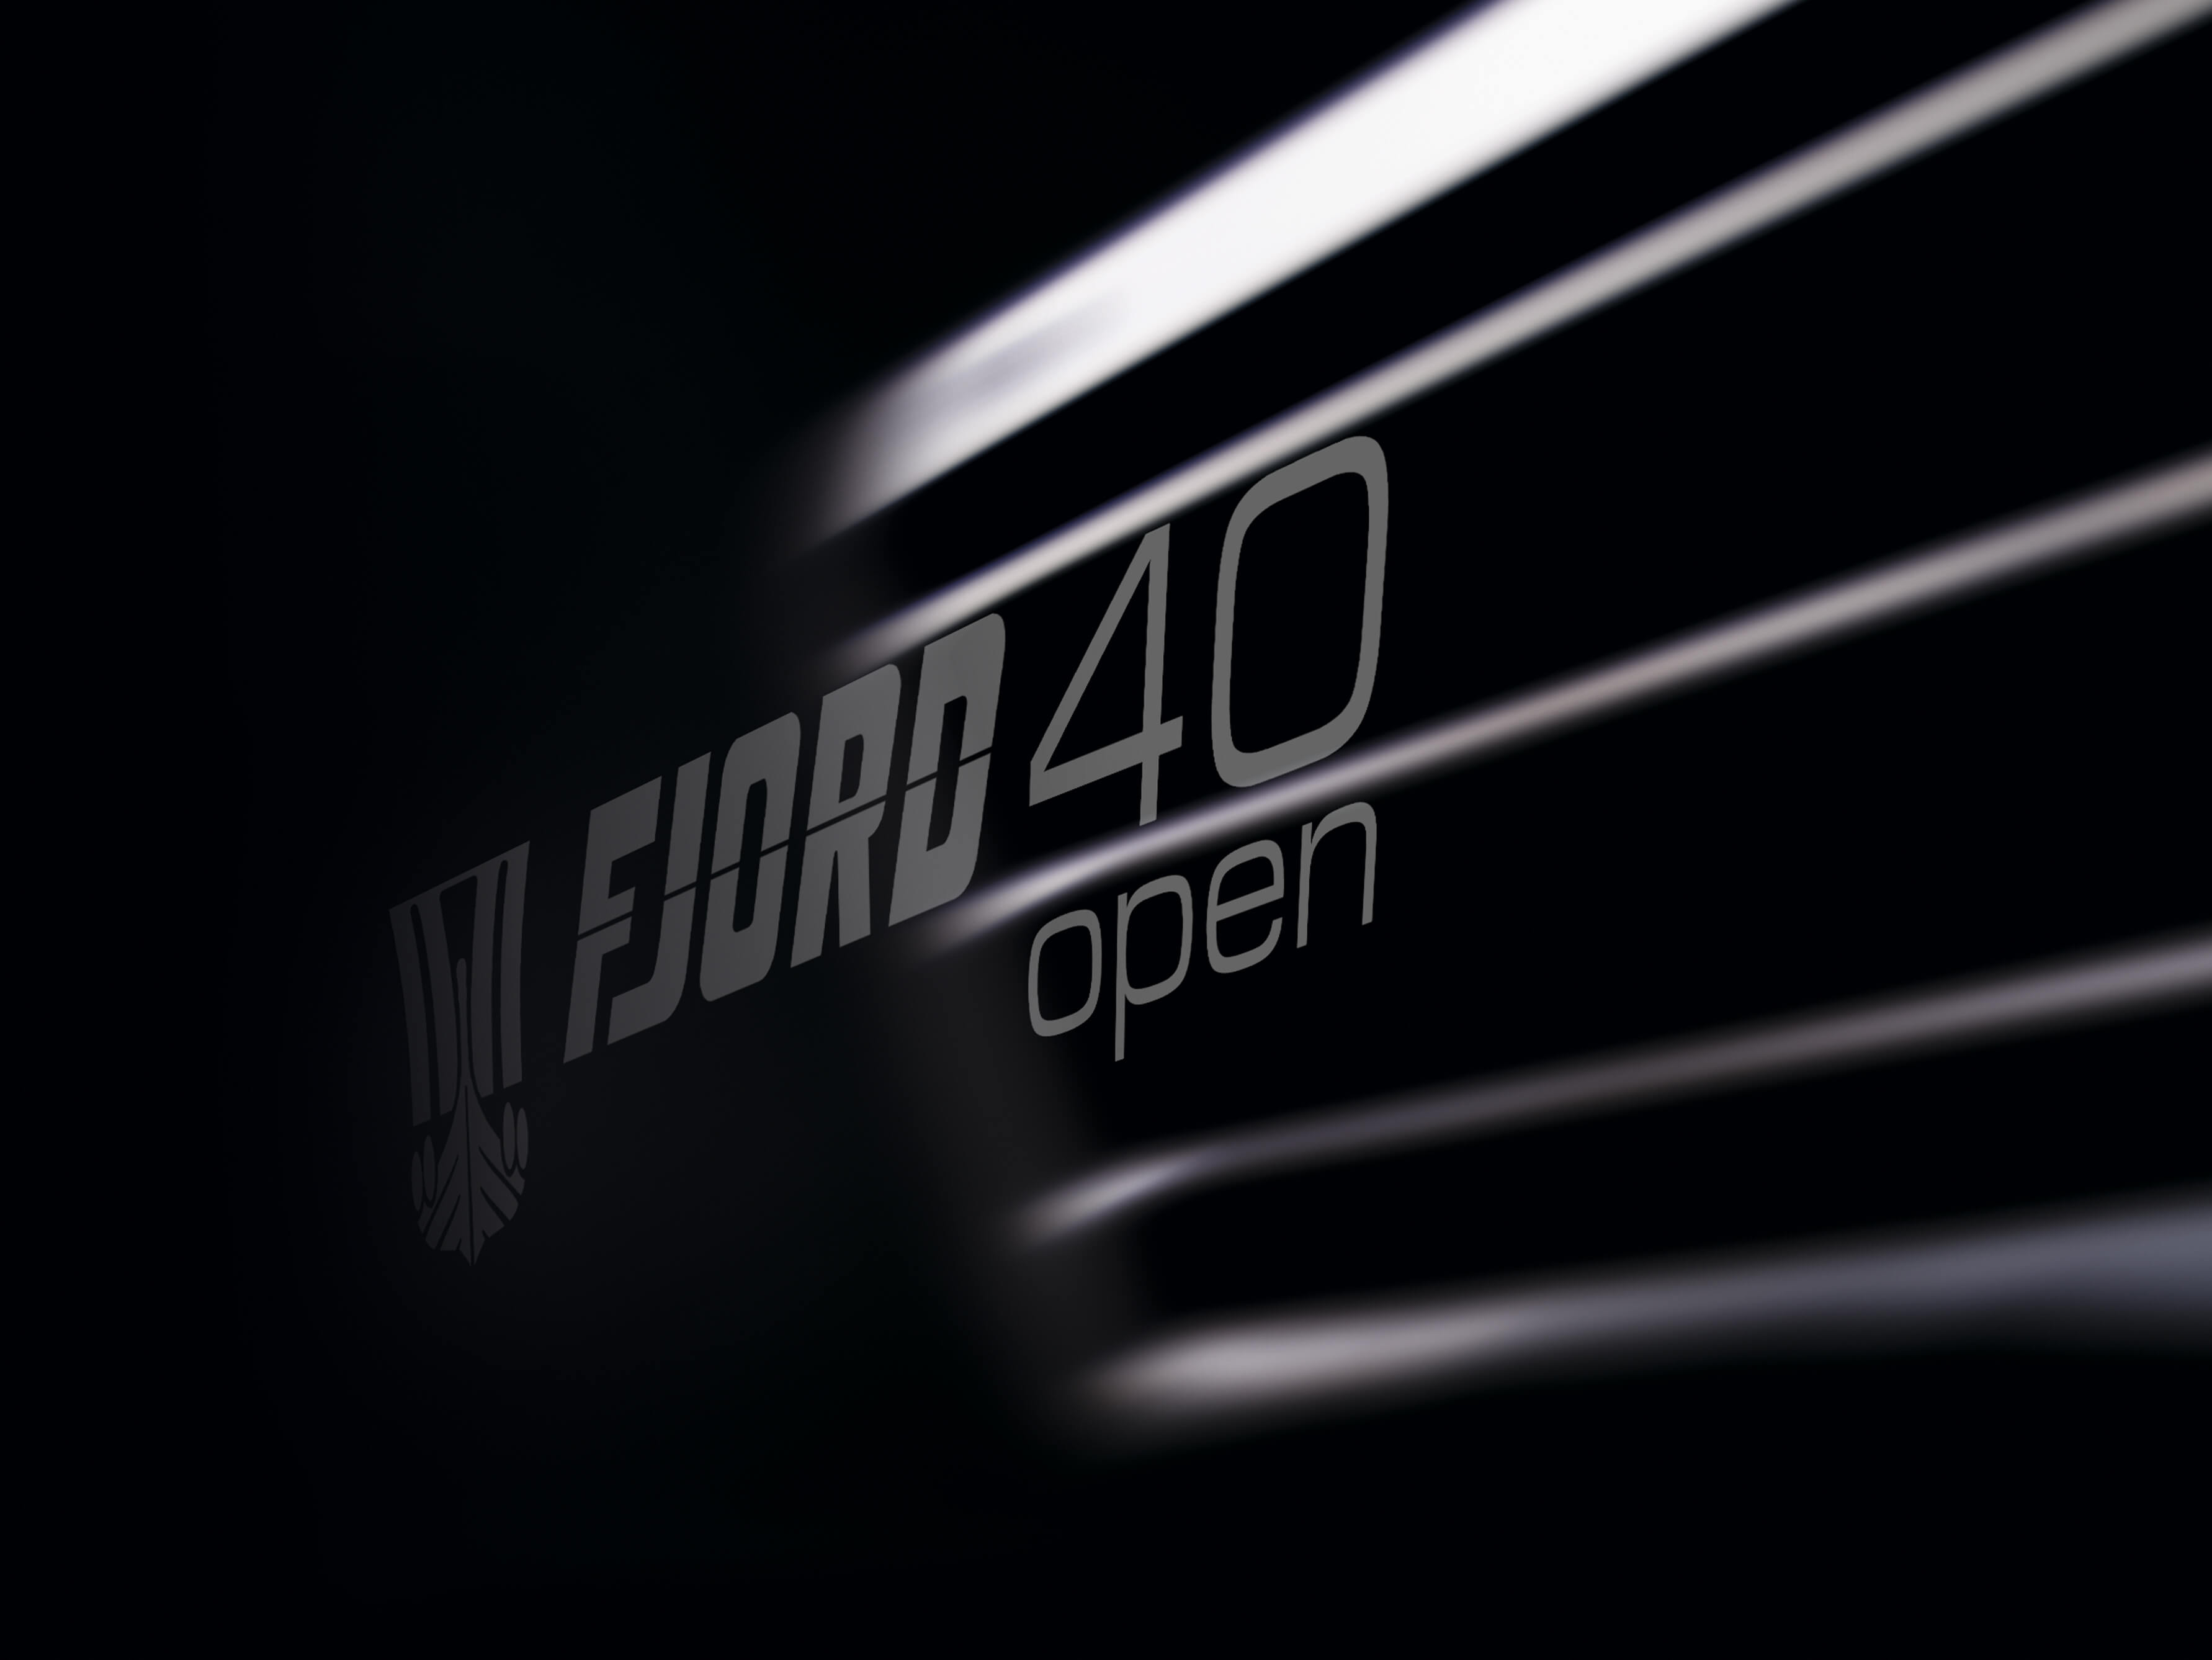 Fjord 40 open Exterior at anchor | logo | Fjord